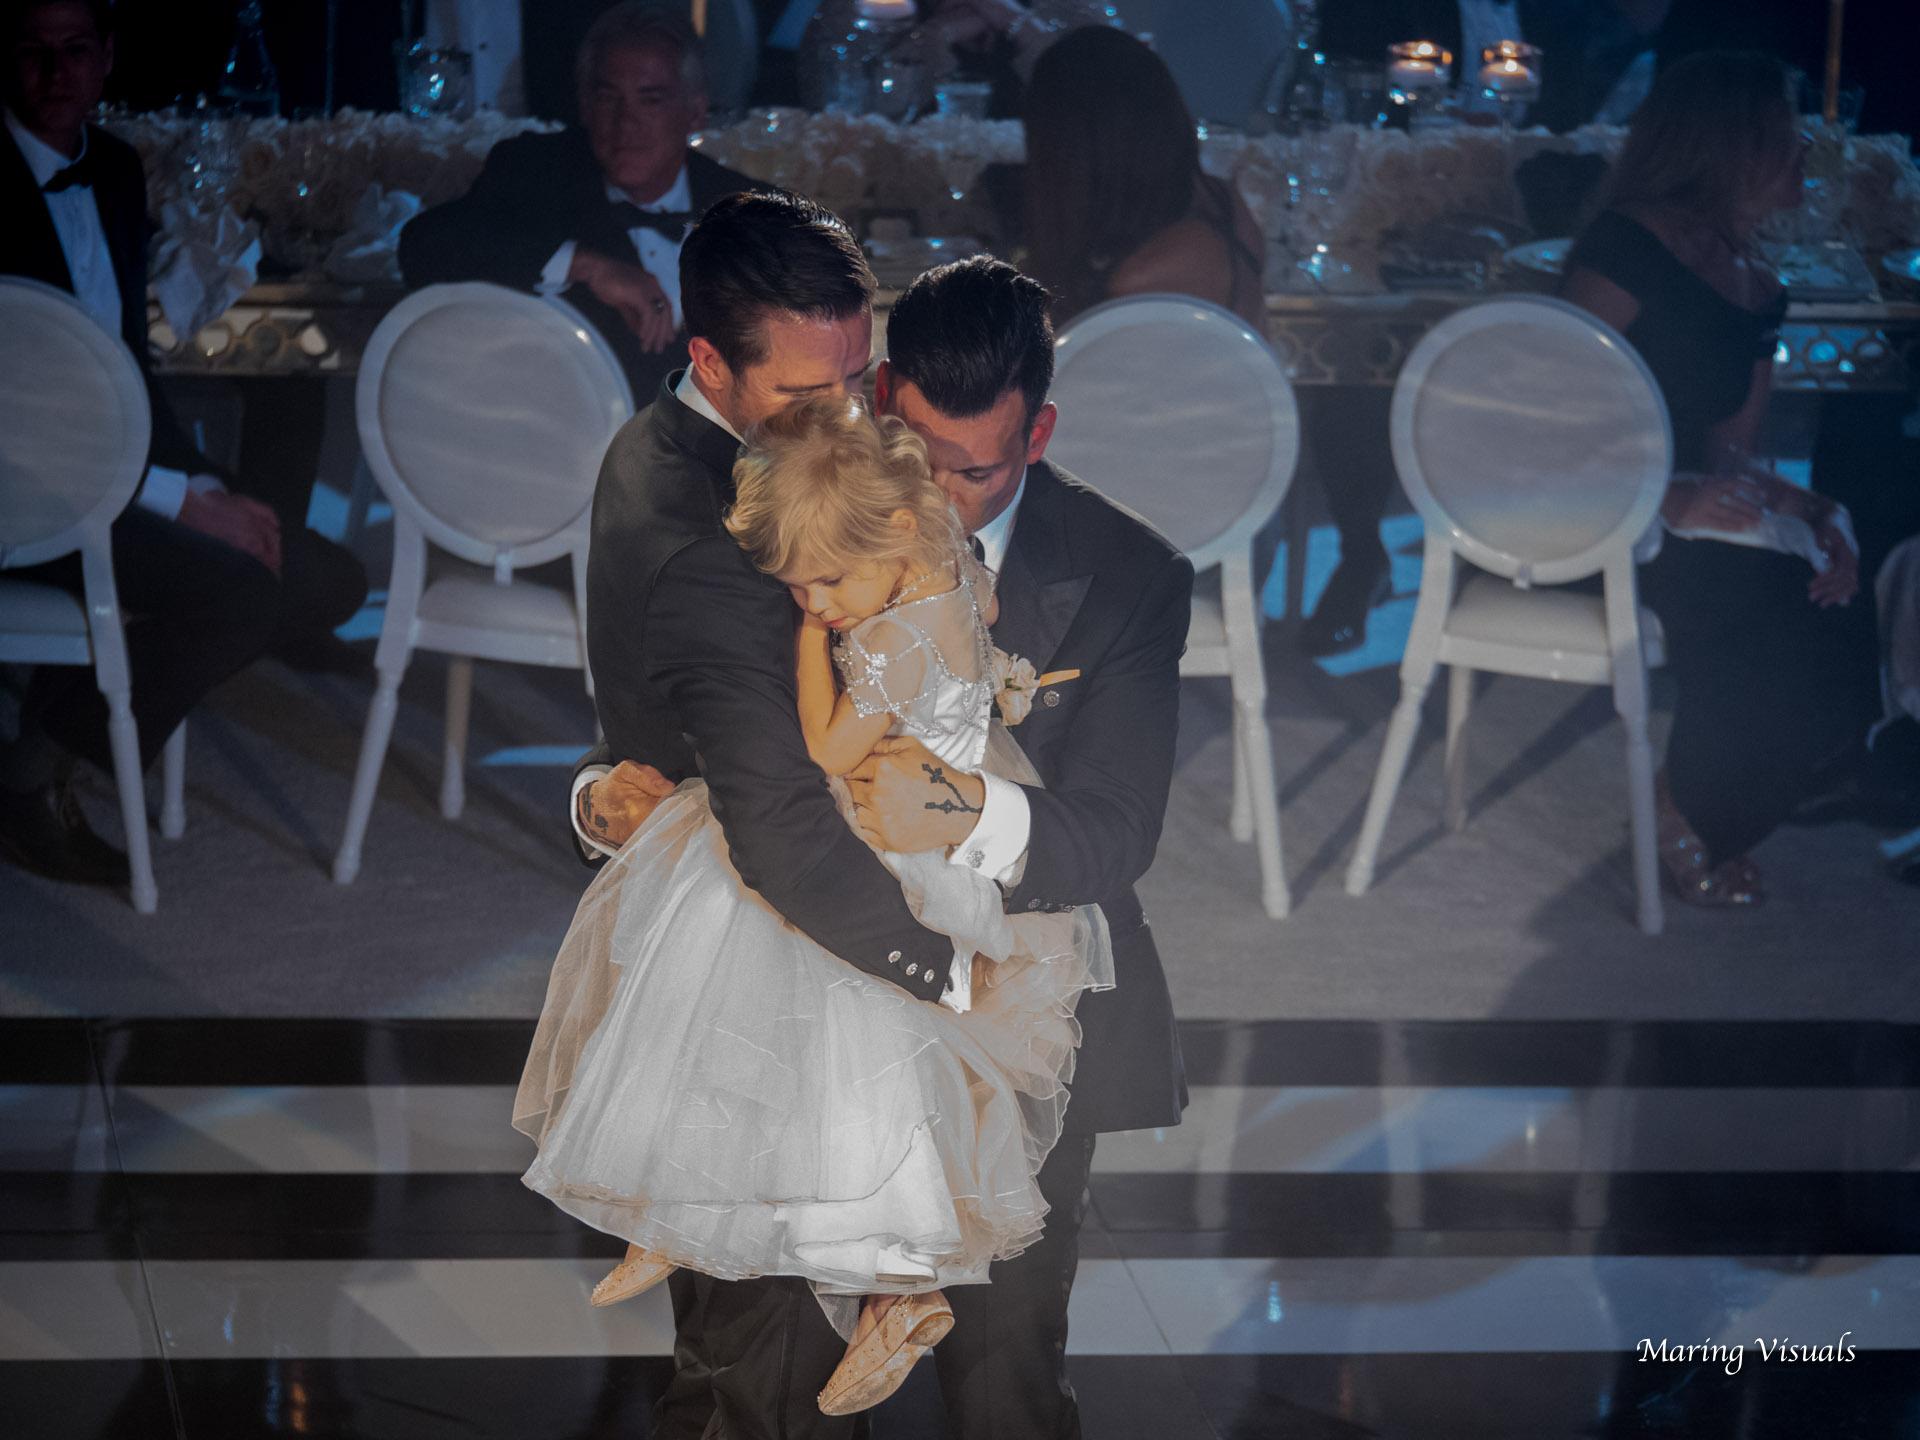 David Tutera Weddings by Maring Visuals 00562.jpg